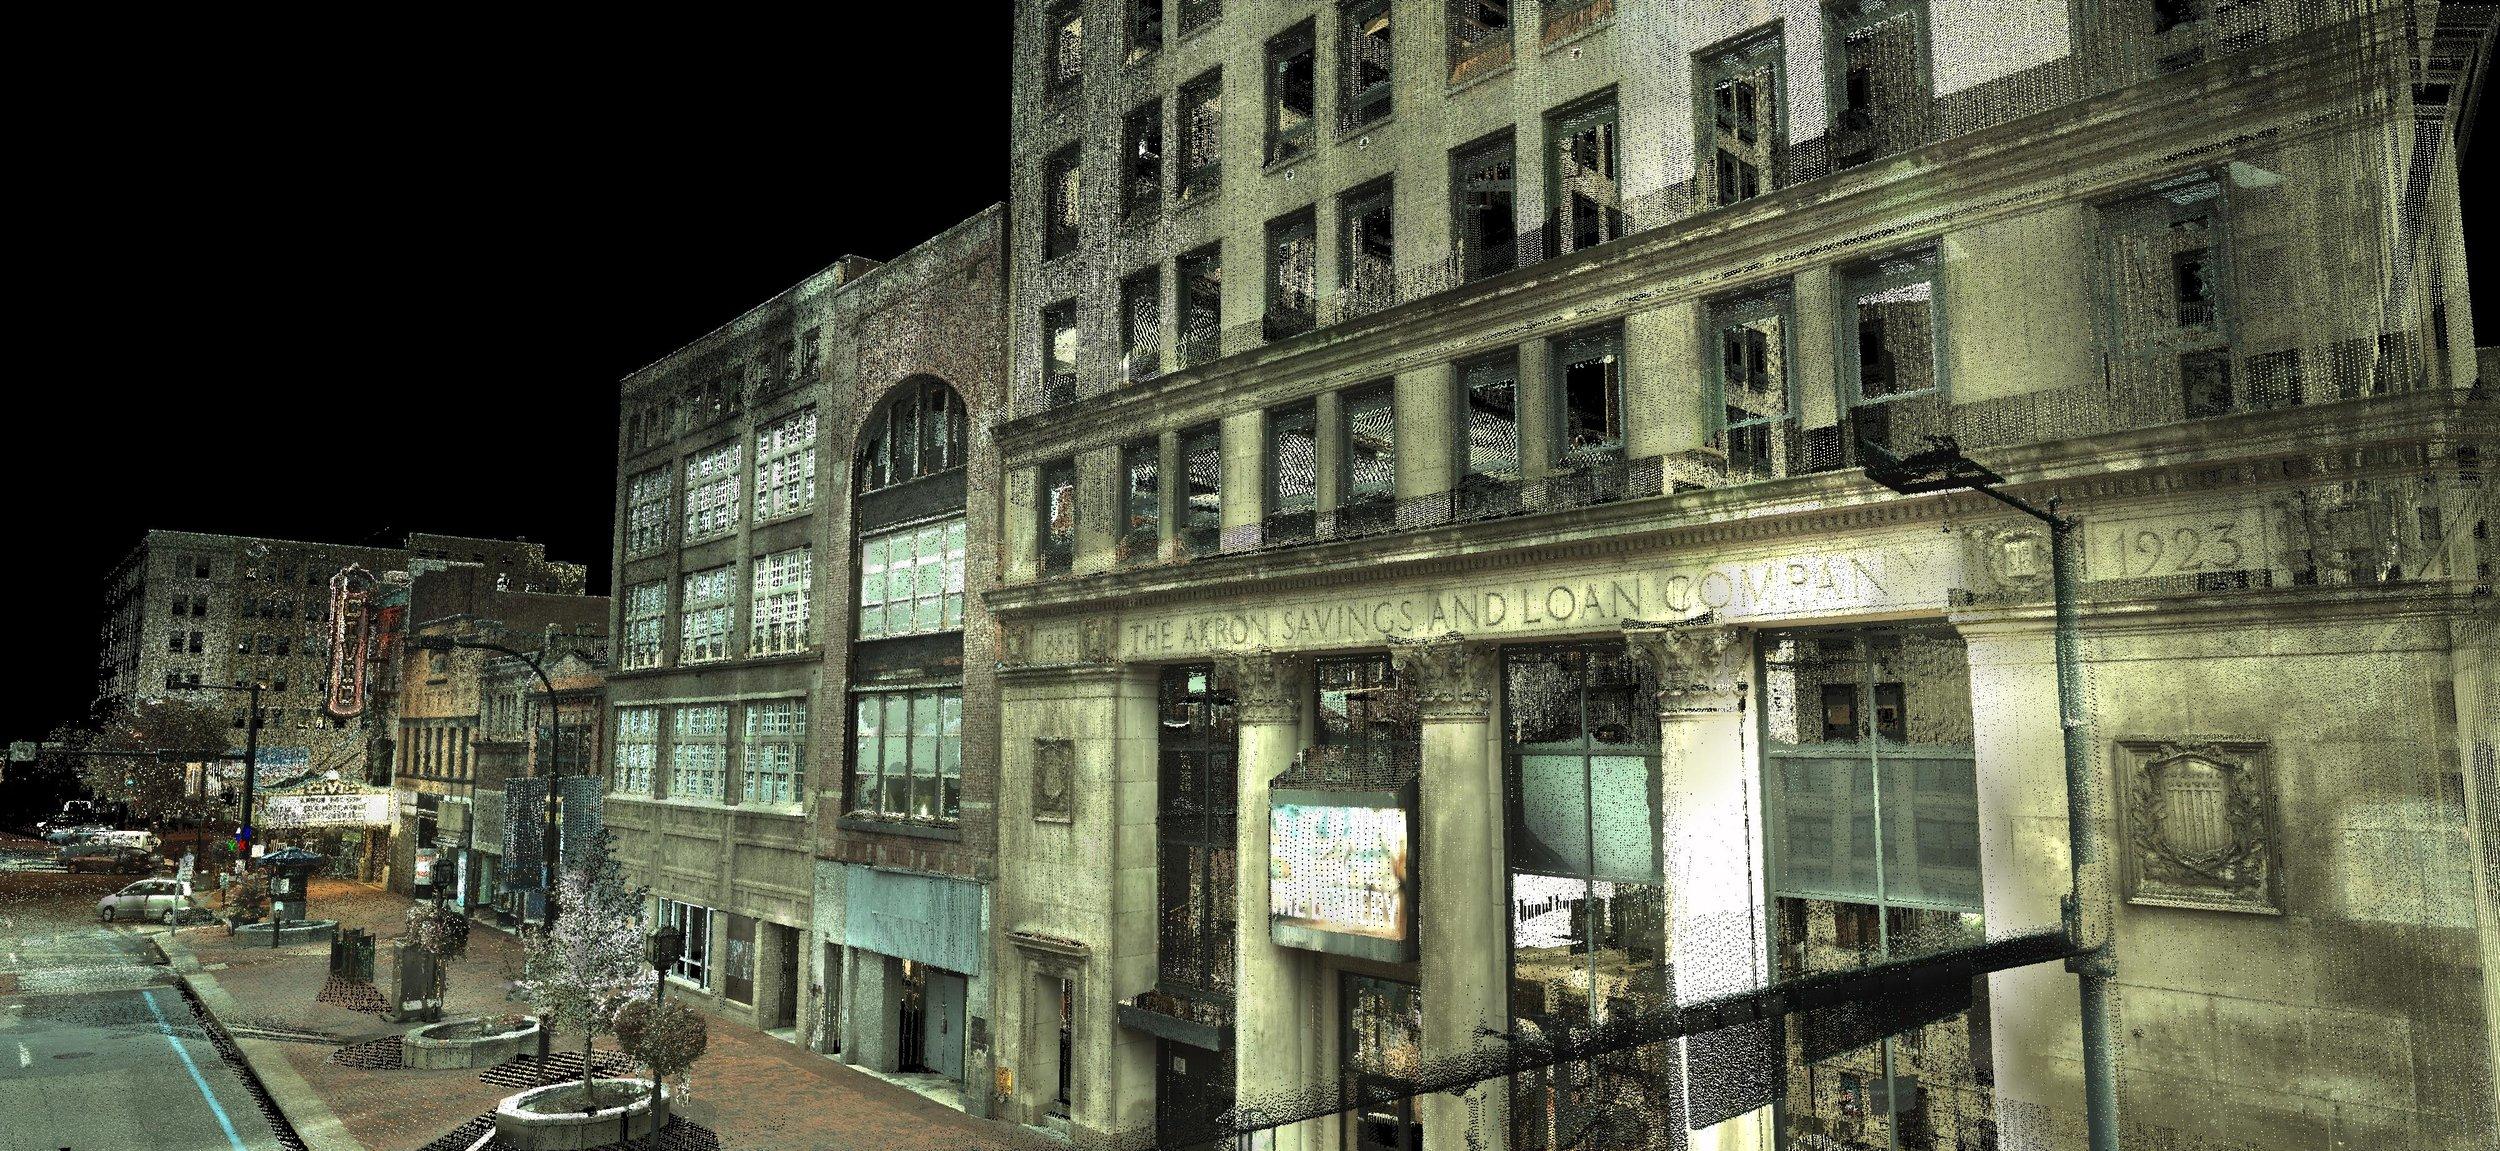 Akron Savings-Loan.jpg